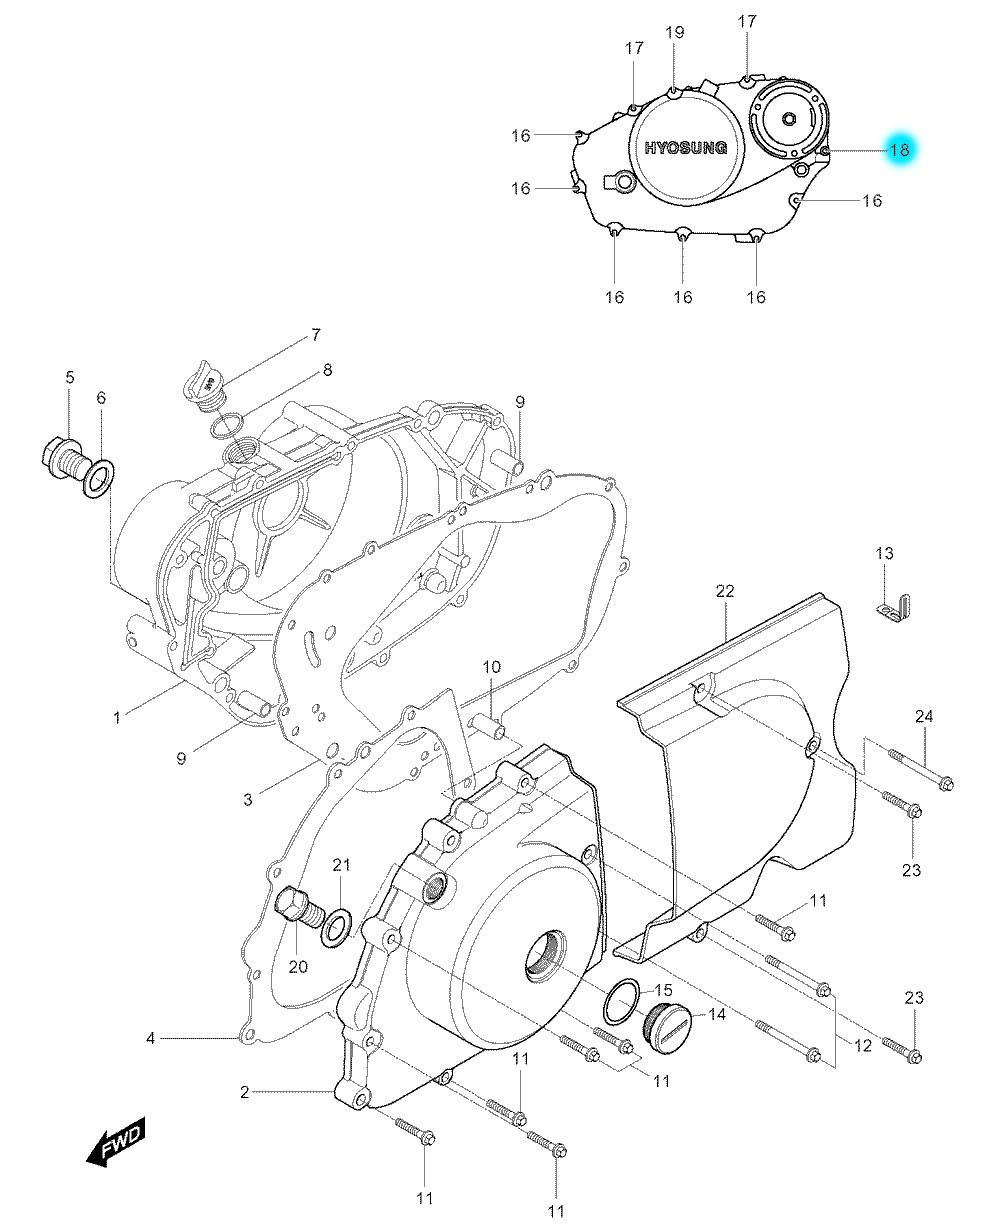 [18] Šroub (motor - kryty skříně) - Hyosung GV 250